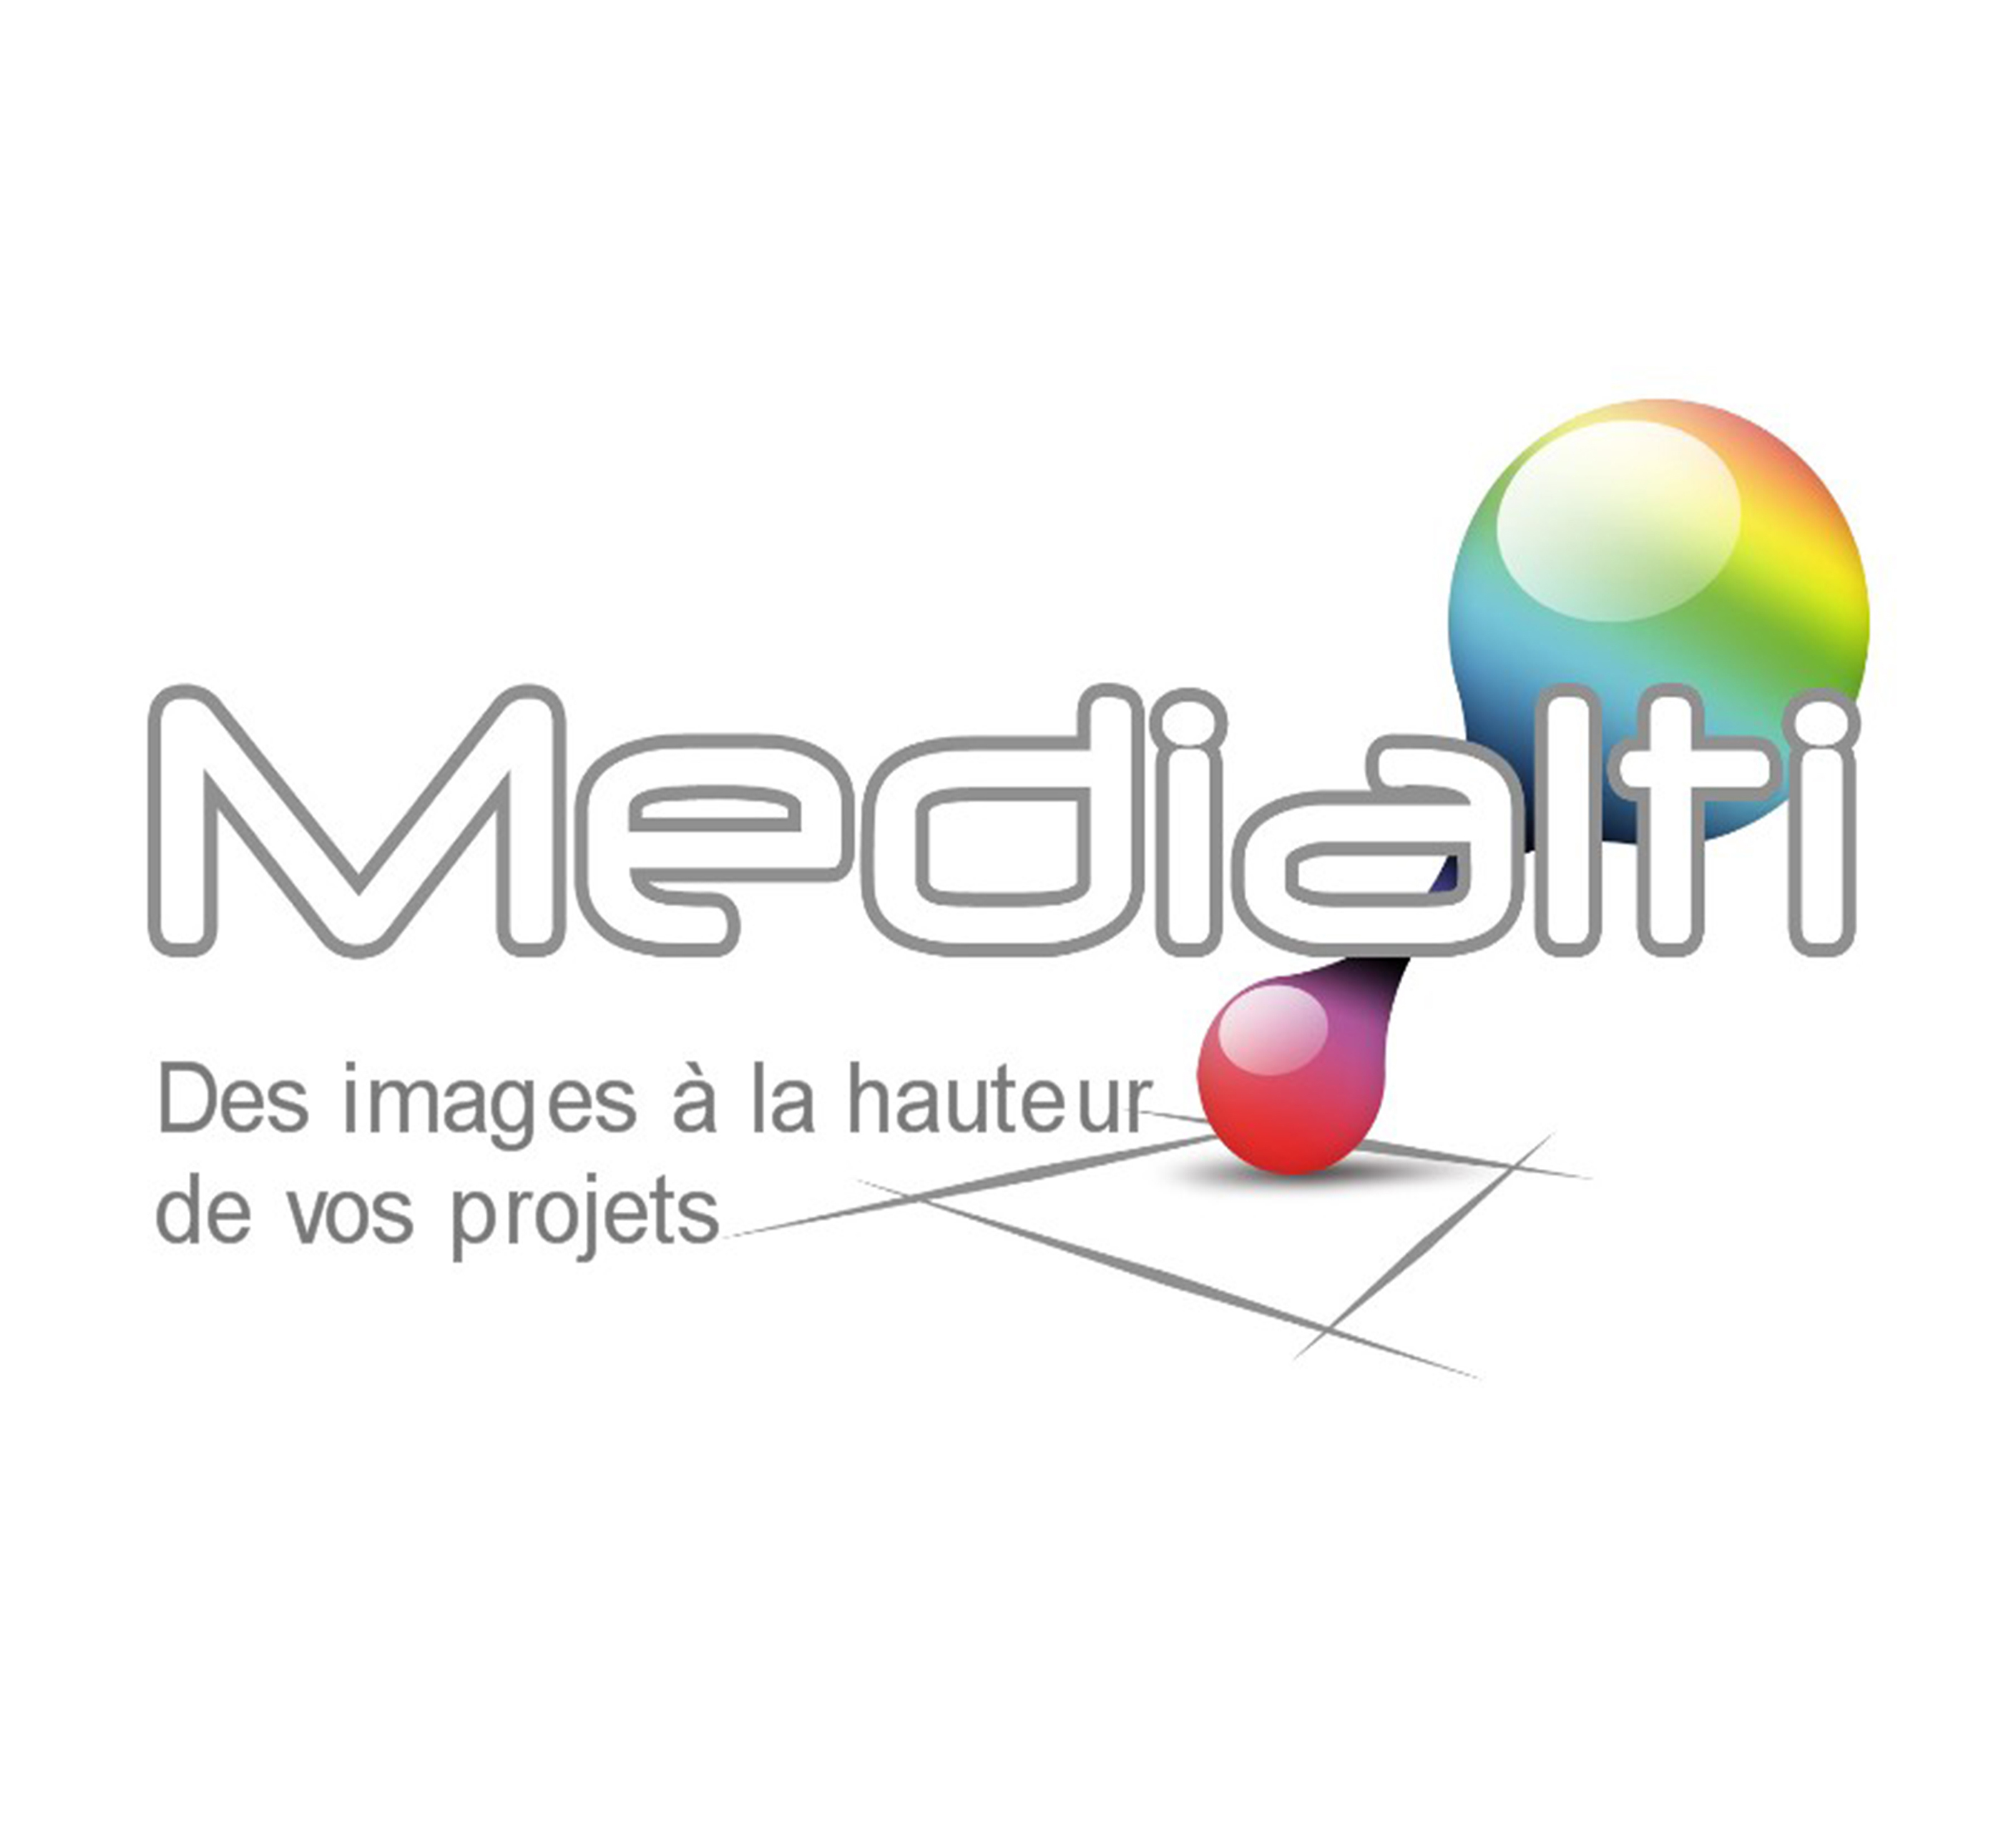 Medialti